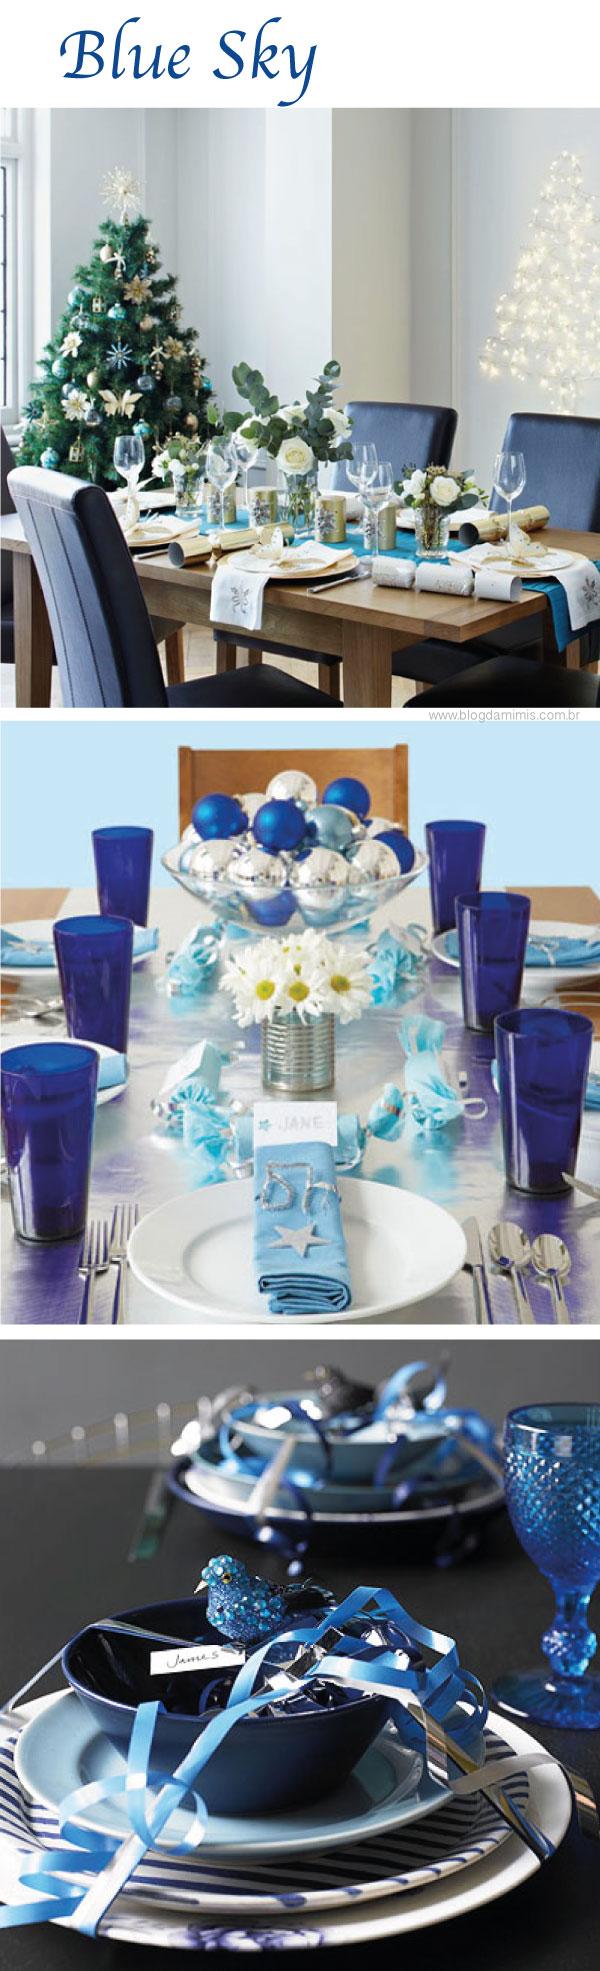 AZUL-BLUE--blog-da-mimis-michelle-franzoni-decoração-natal